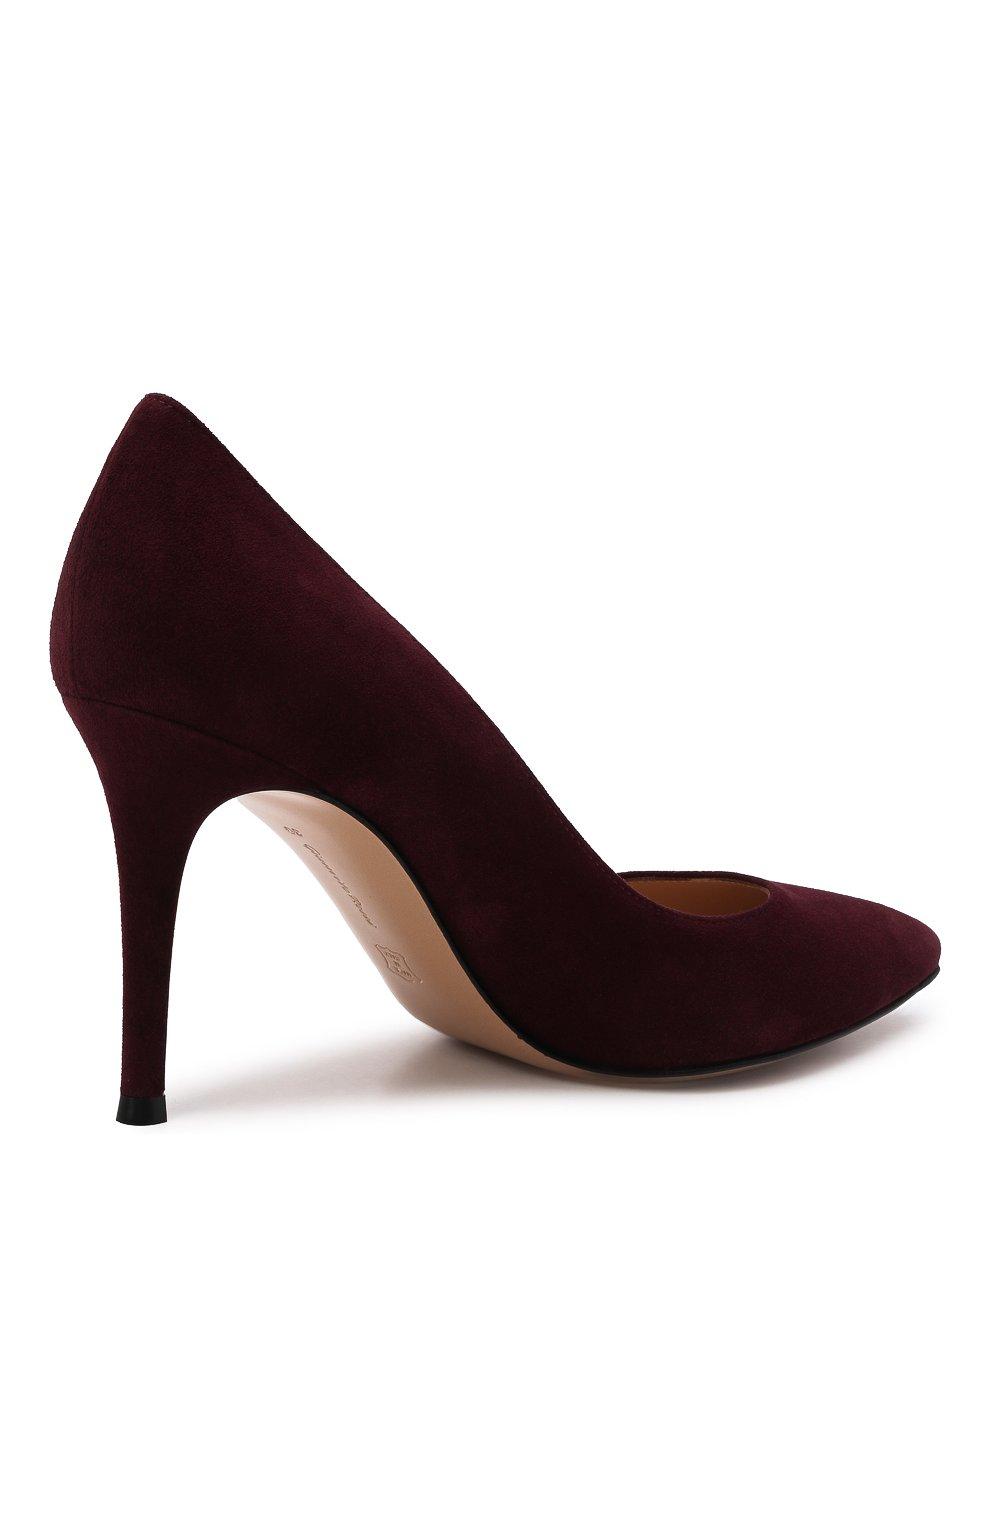 Женские замшевые туфли gianvito 85 GIANVITO ROSSI бордового цвета, арт. G24580.85RIC.CAMR0YA | Фото 5